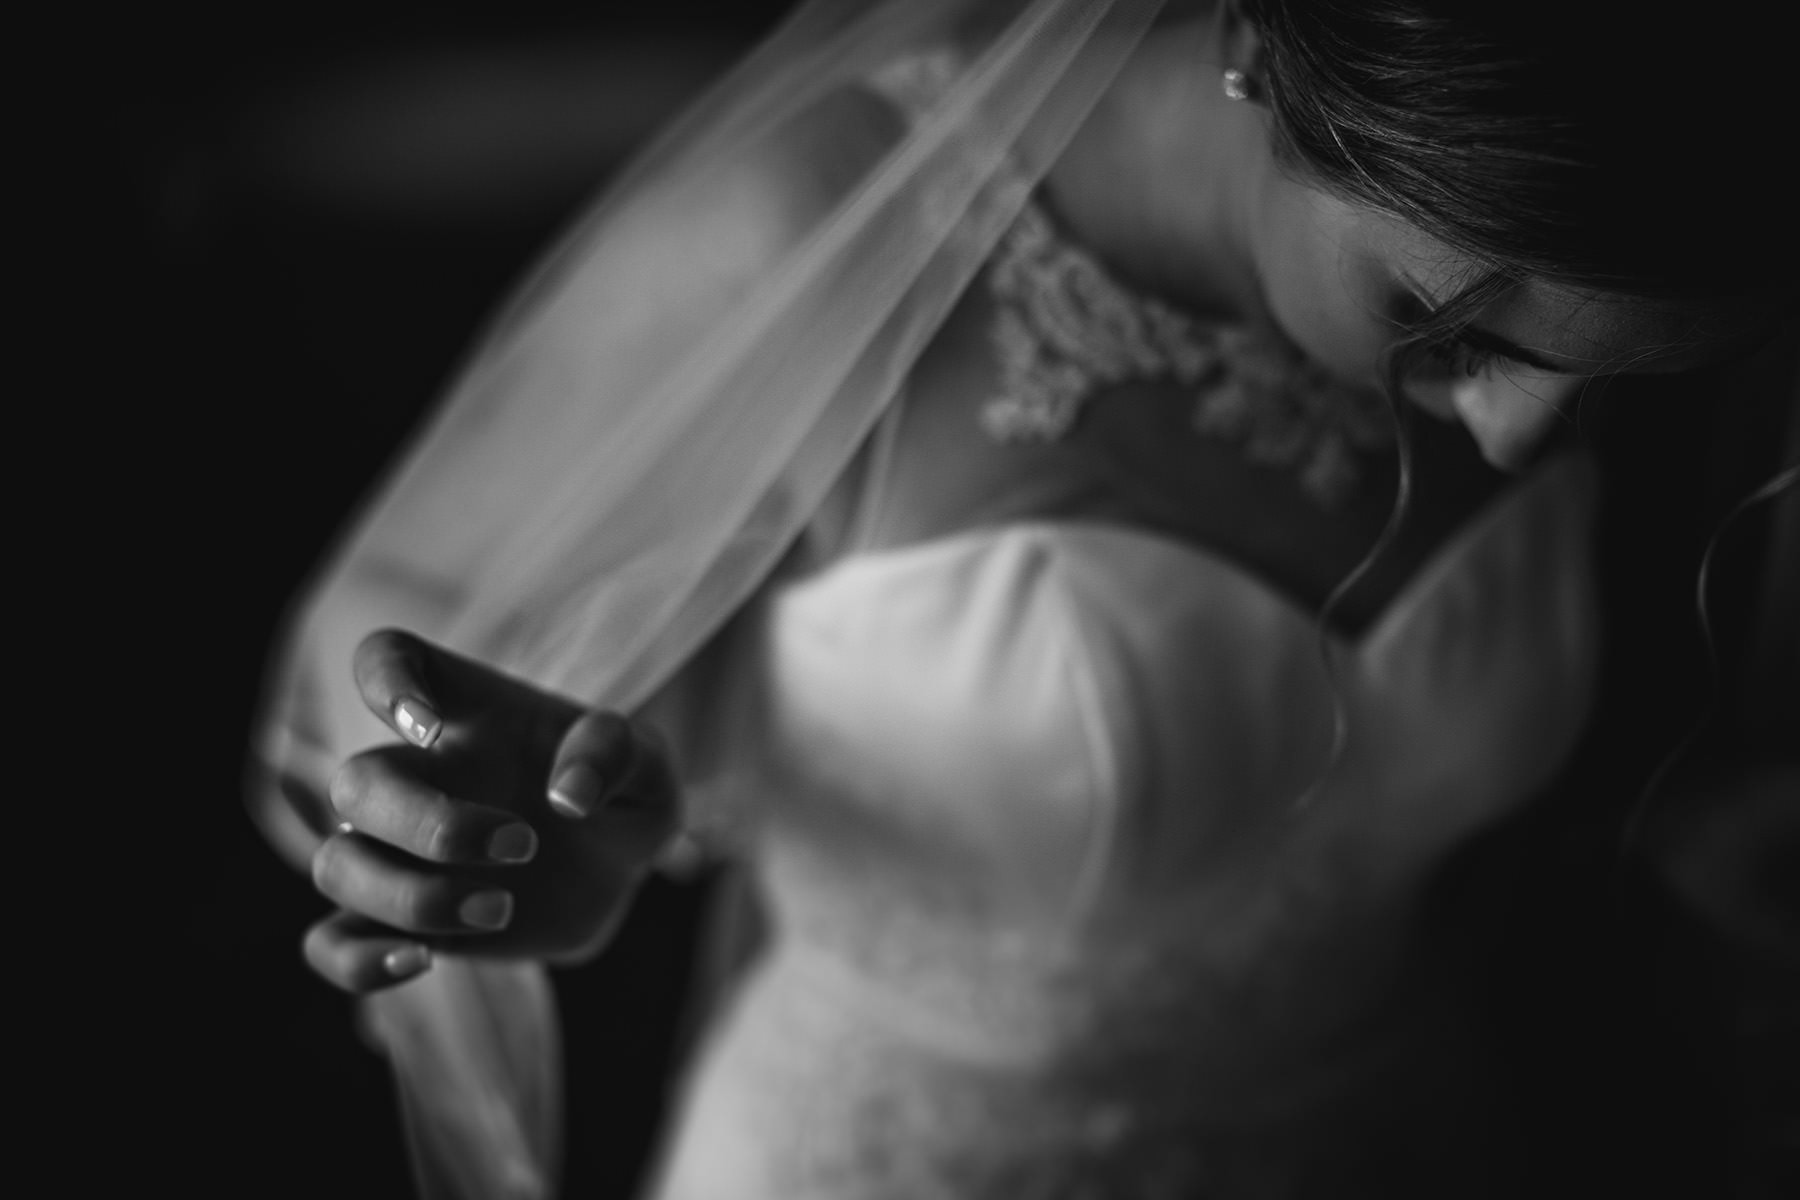 the bride putting on her wedding viel at Makeney Hall